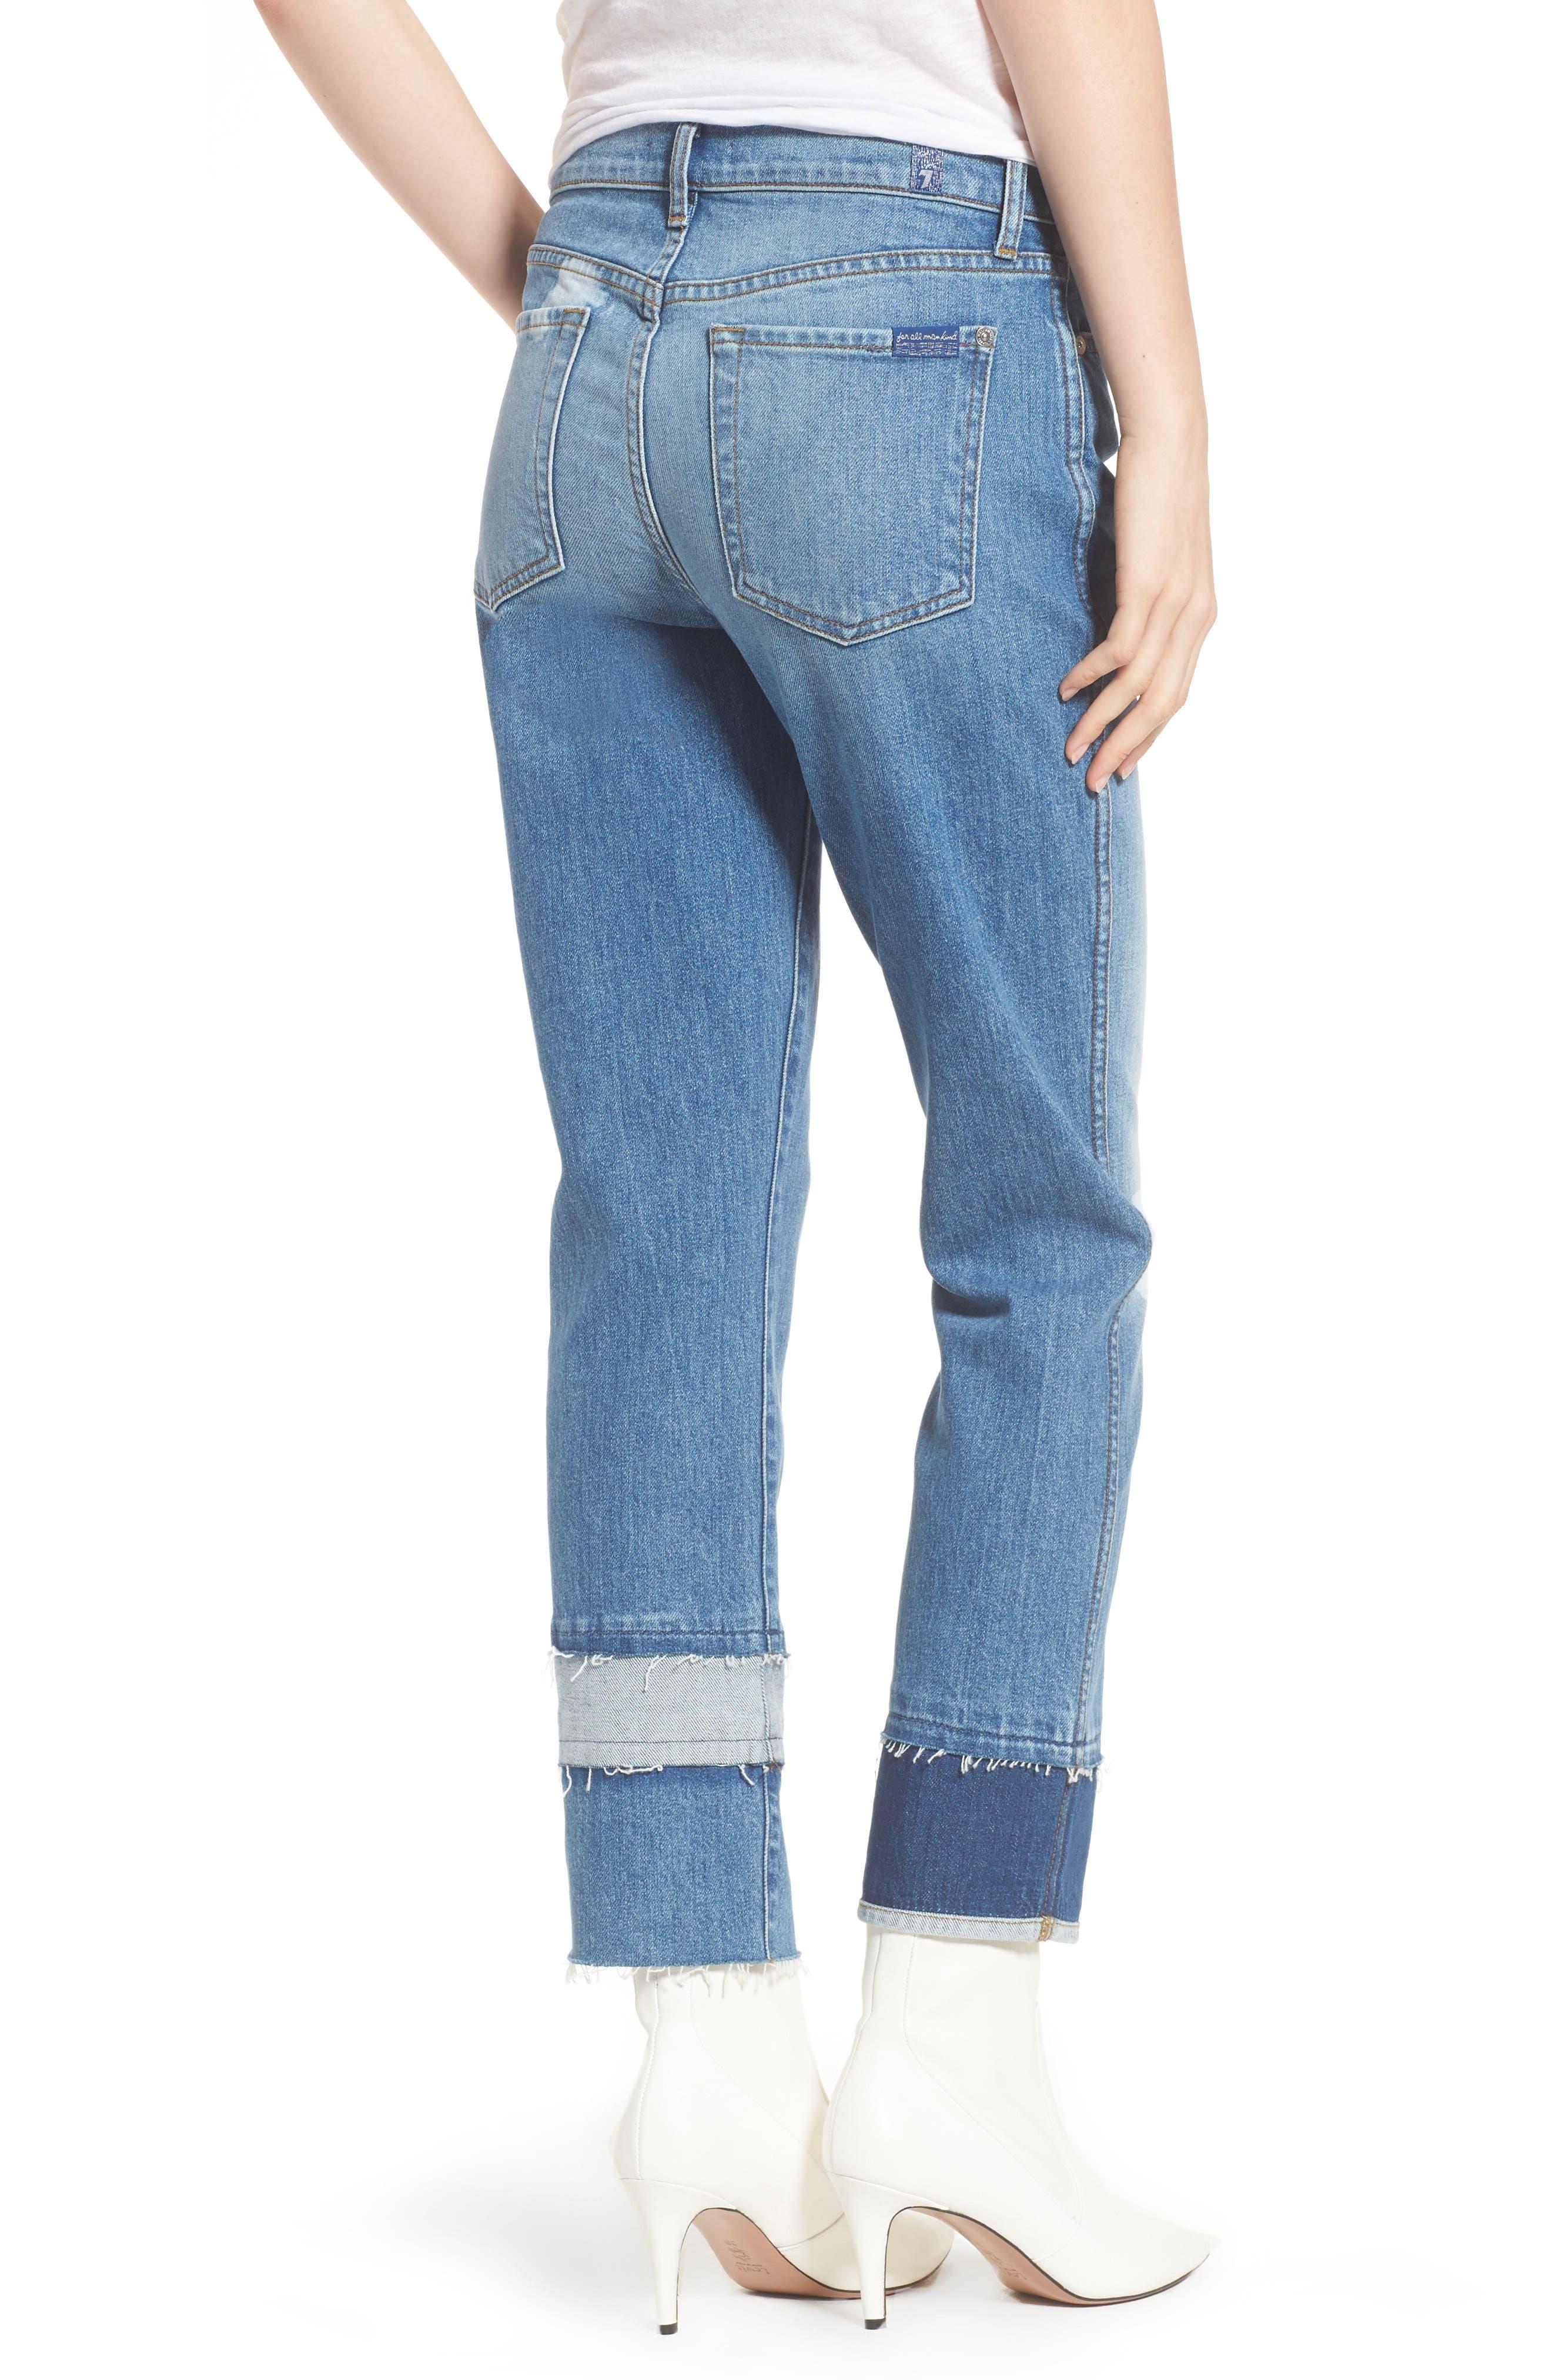 Edie Pieced Hem Cropped Jeans,                             Alternate thumbnail 2, color,                             Vintage Blue Dunes 2